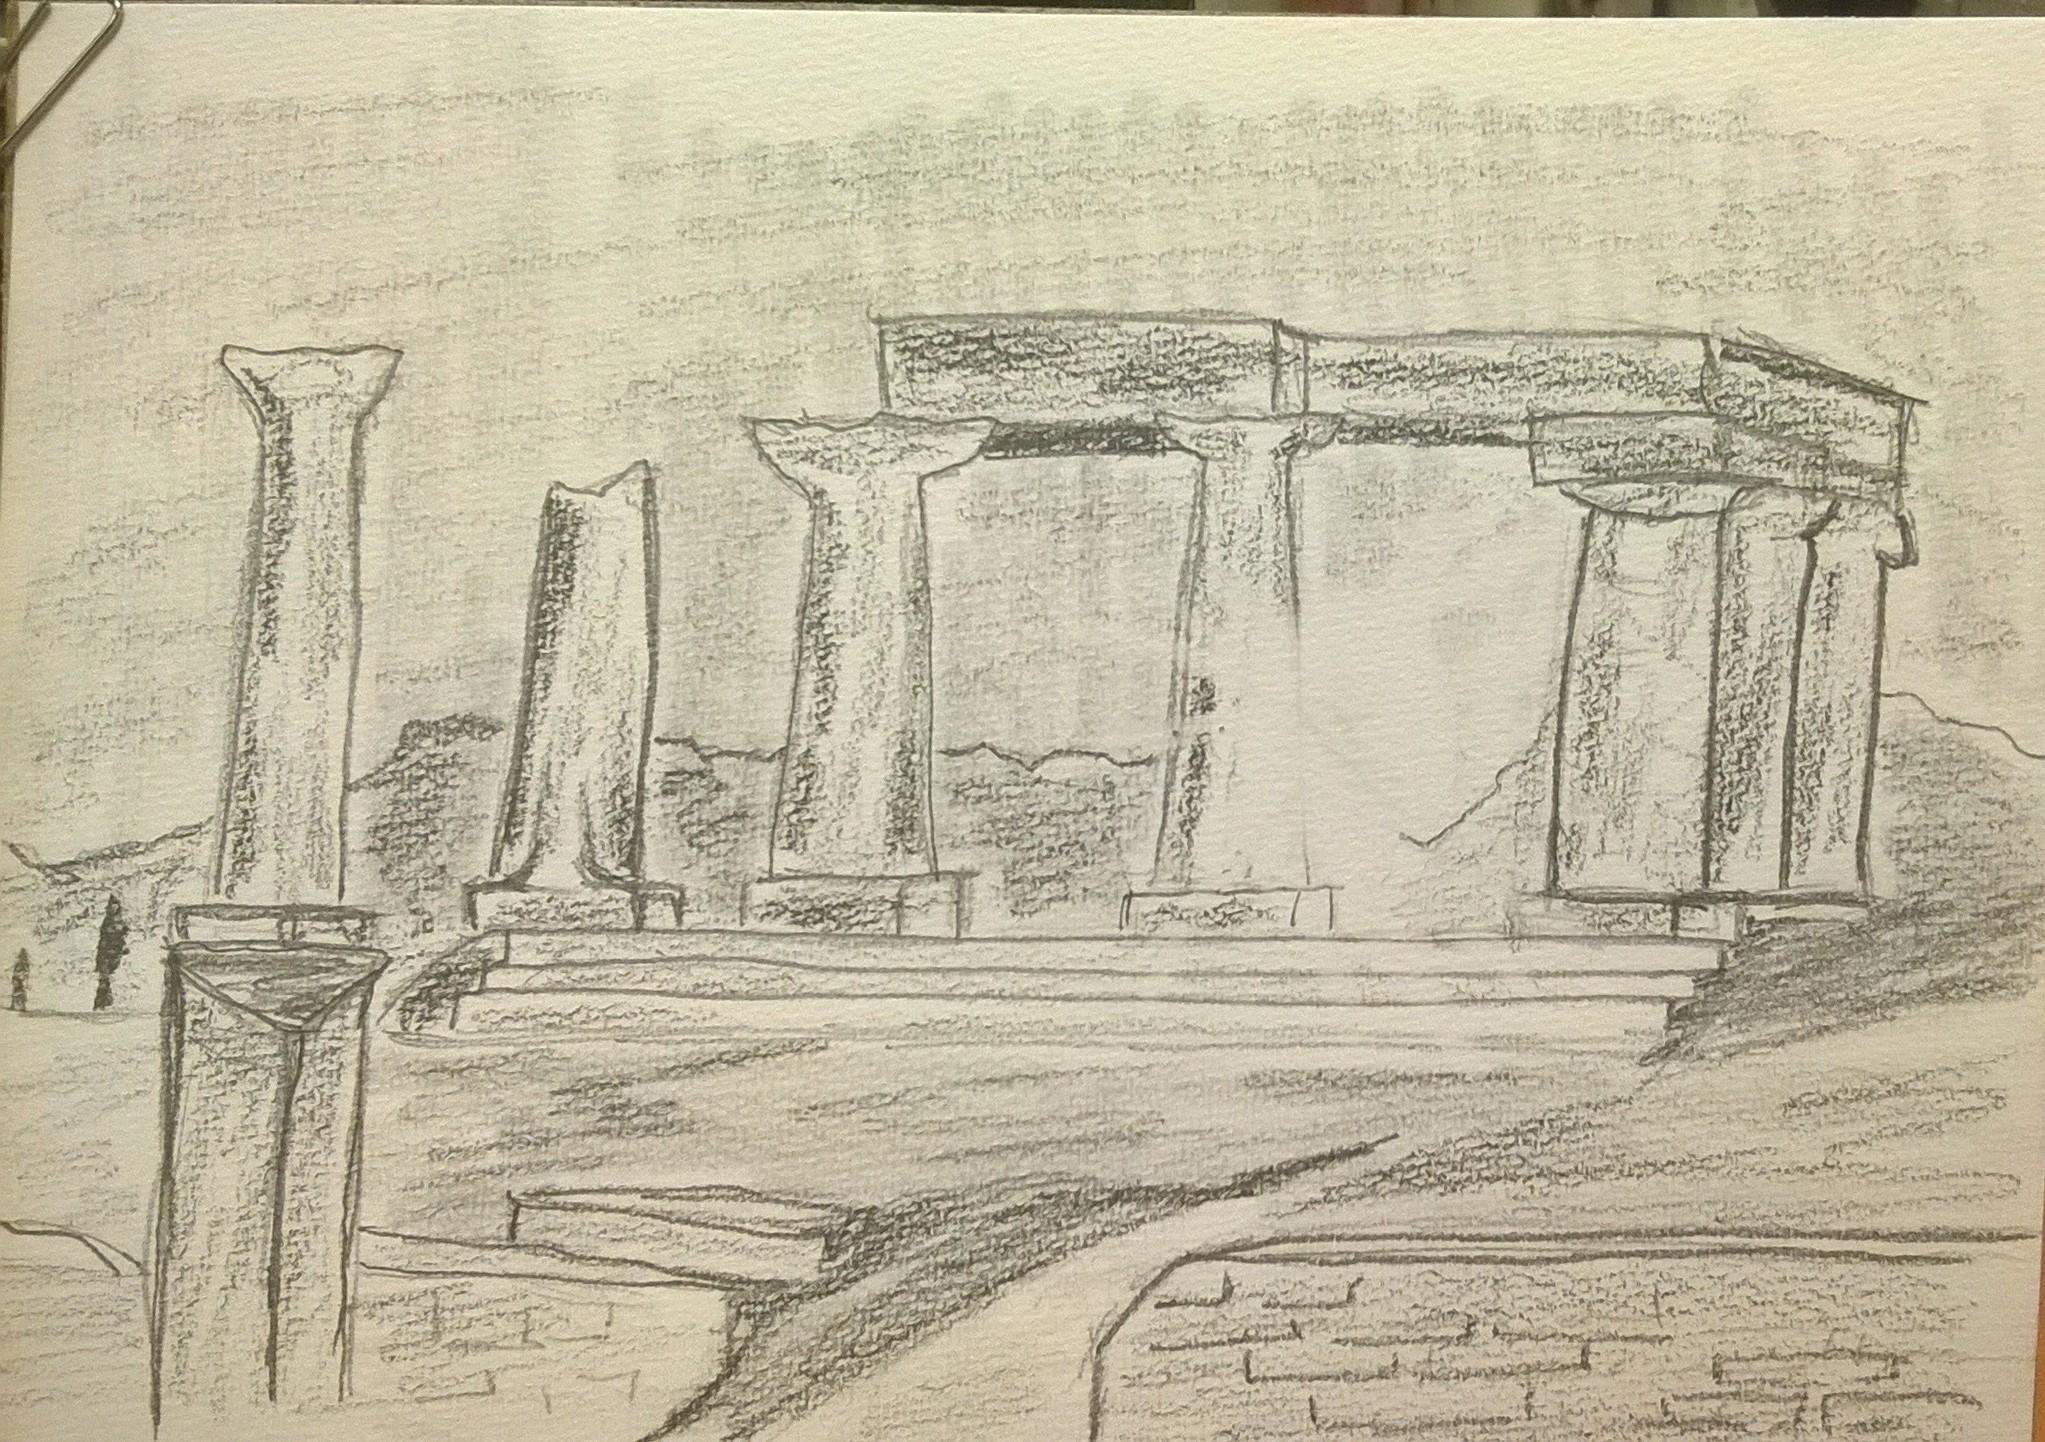 Dessin Ruine egyptienne de Claude16